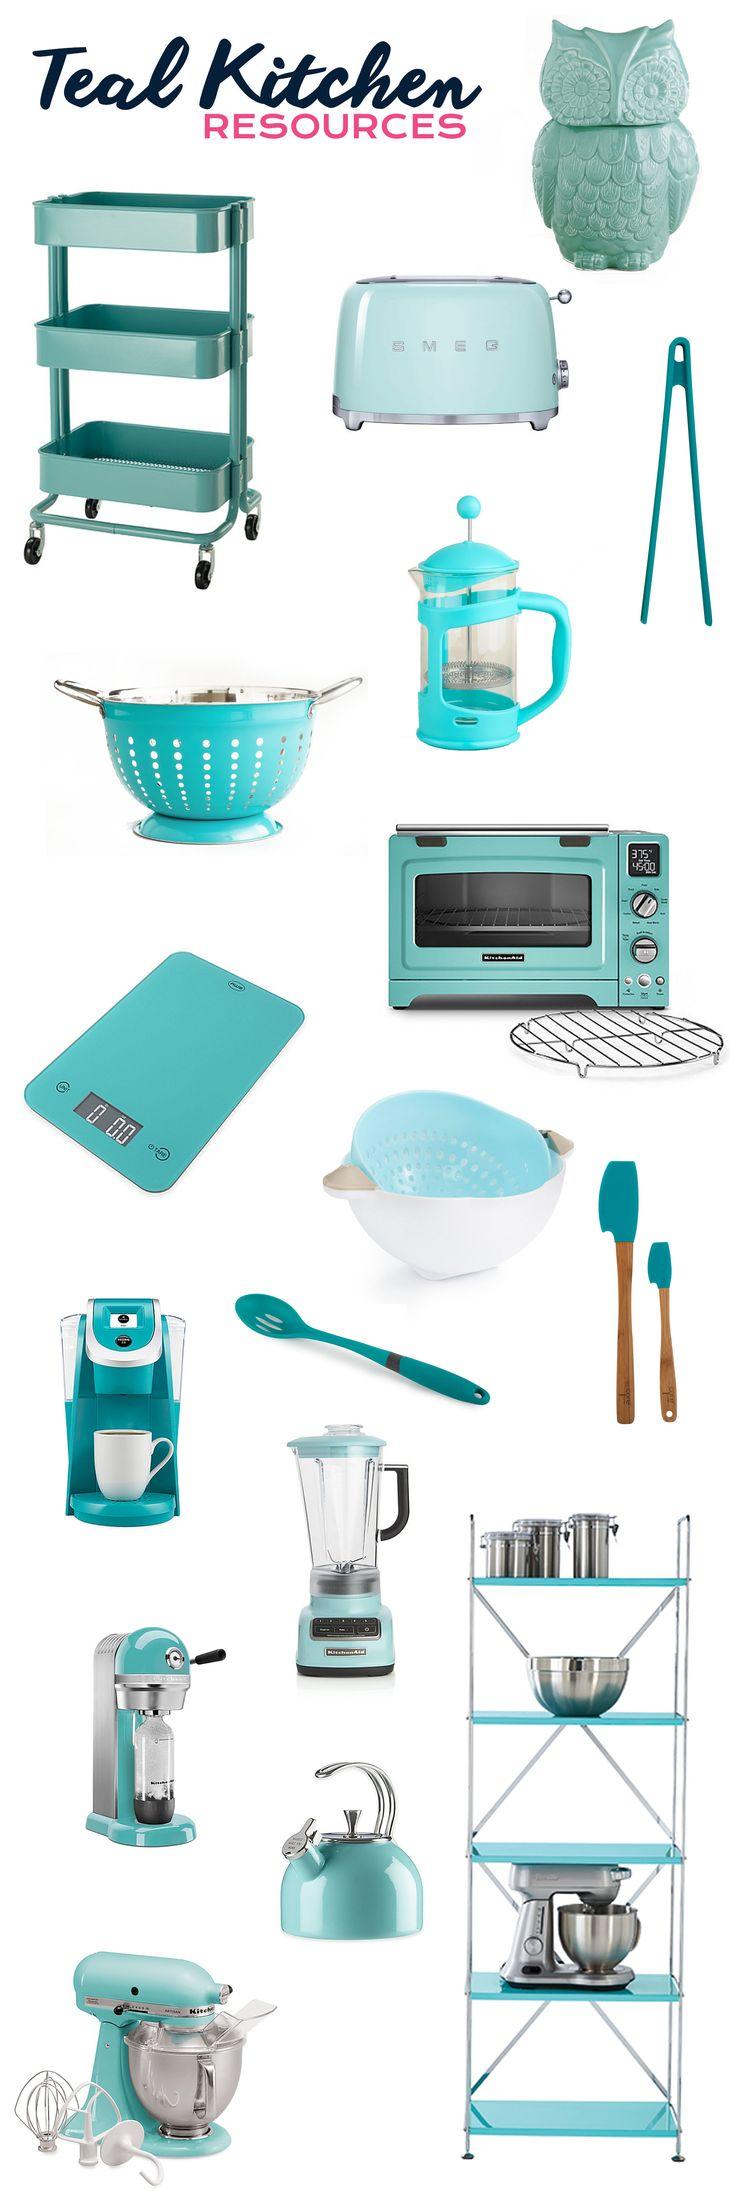 71 best kitchen images on Pinterest | Cooking ware, Kitchen stuff ...